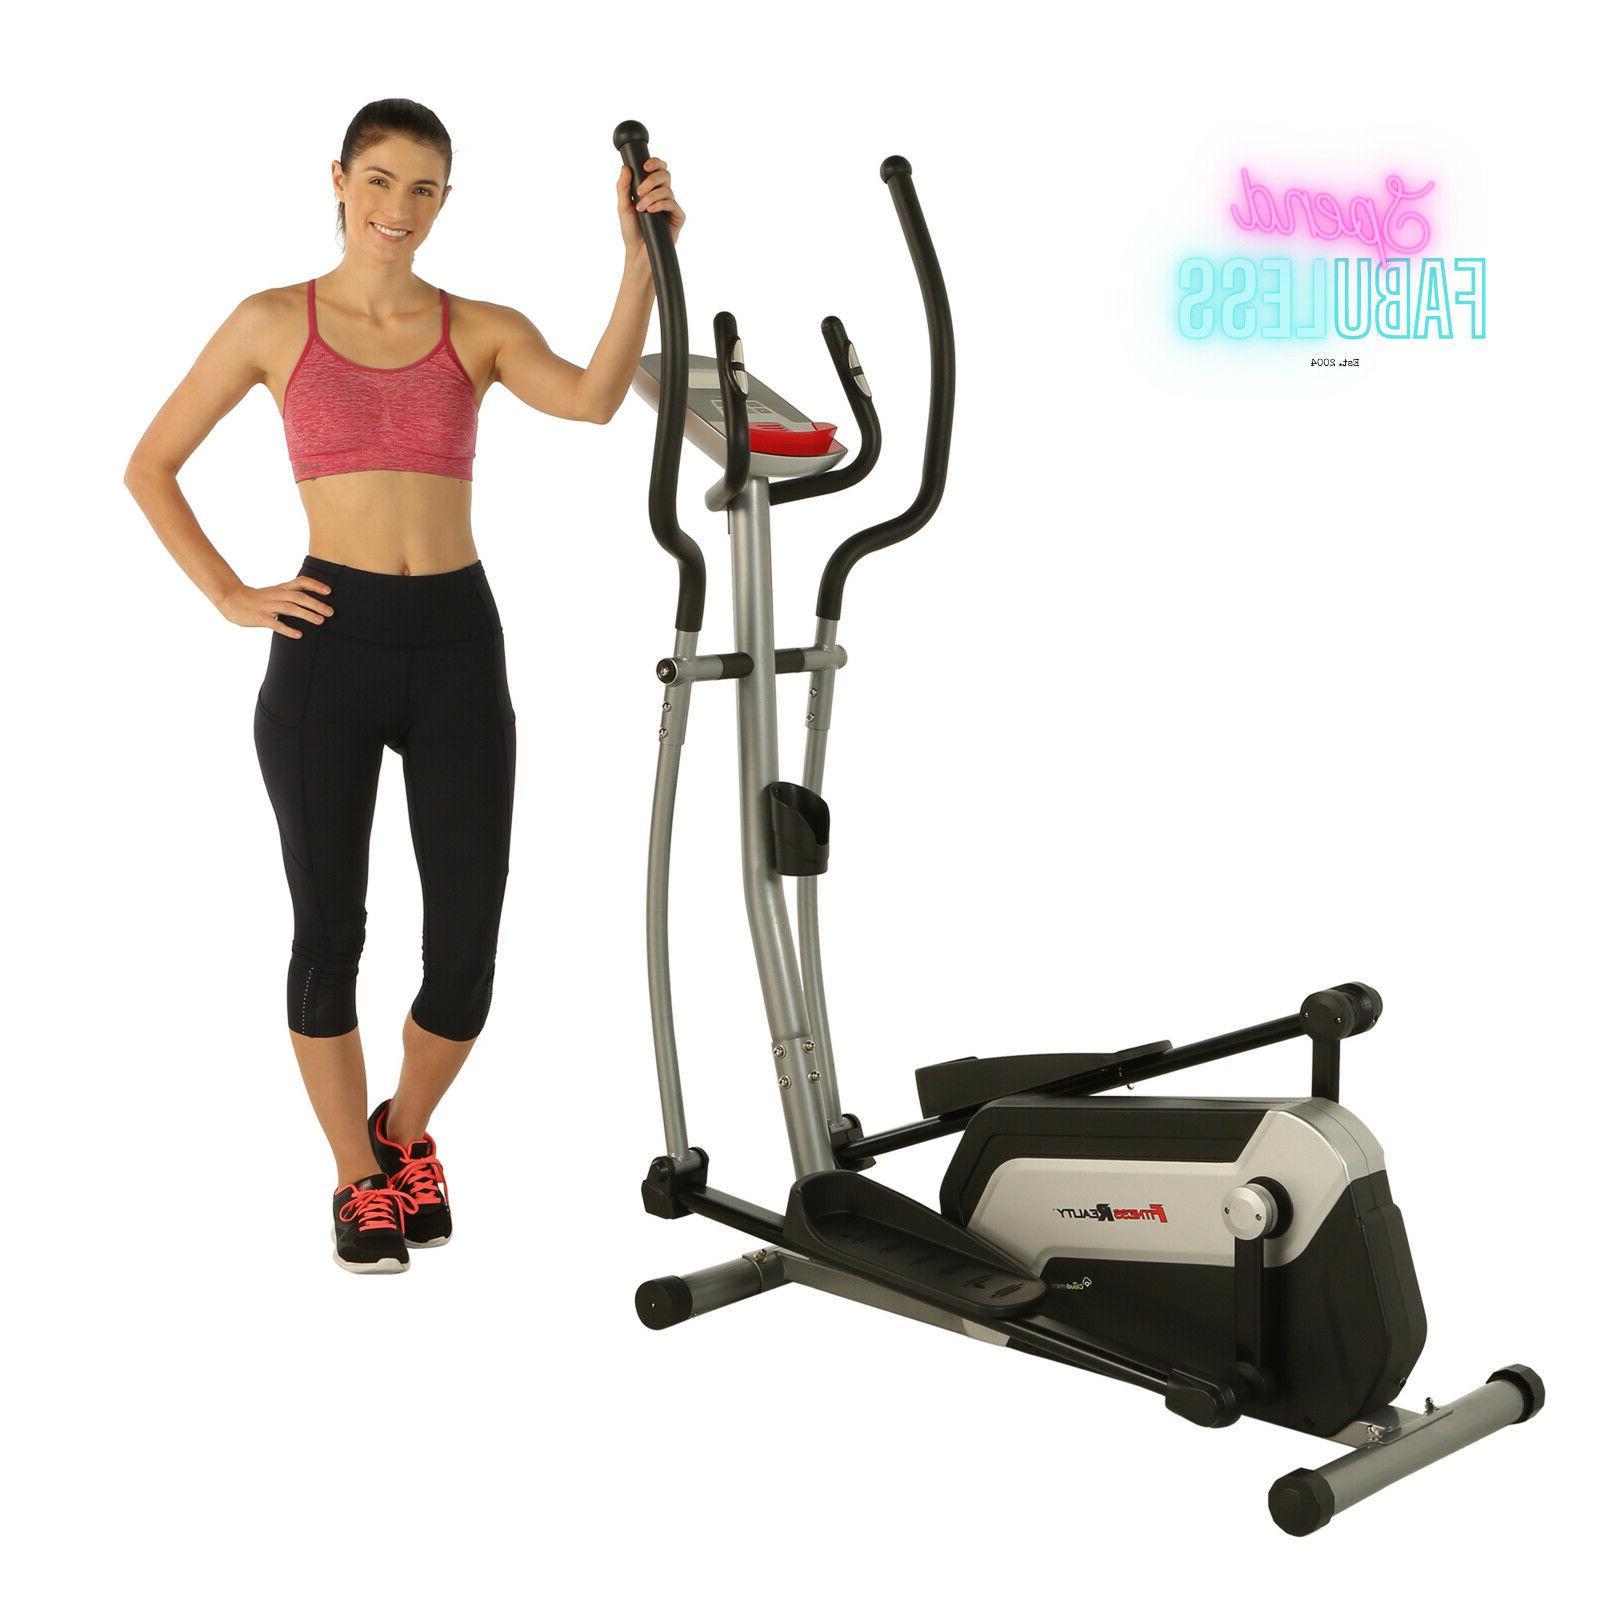 Bluetooth Smart Elliptical Exercise Workout Machine New